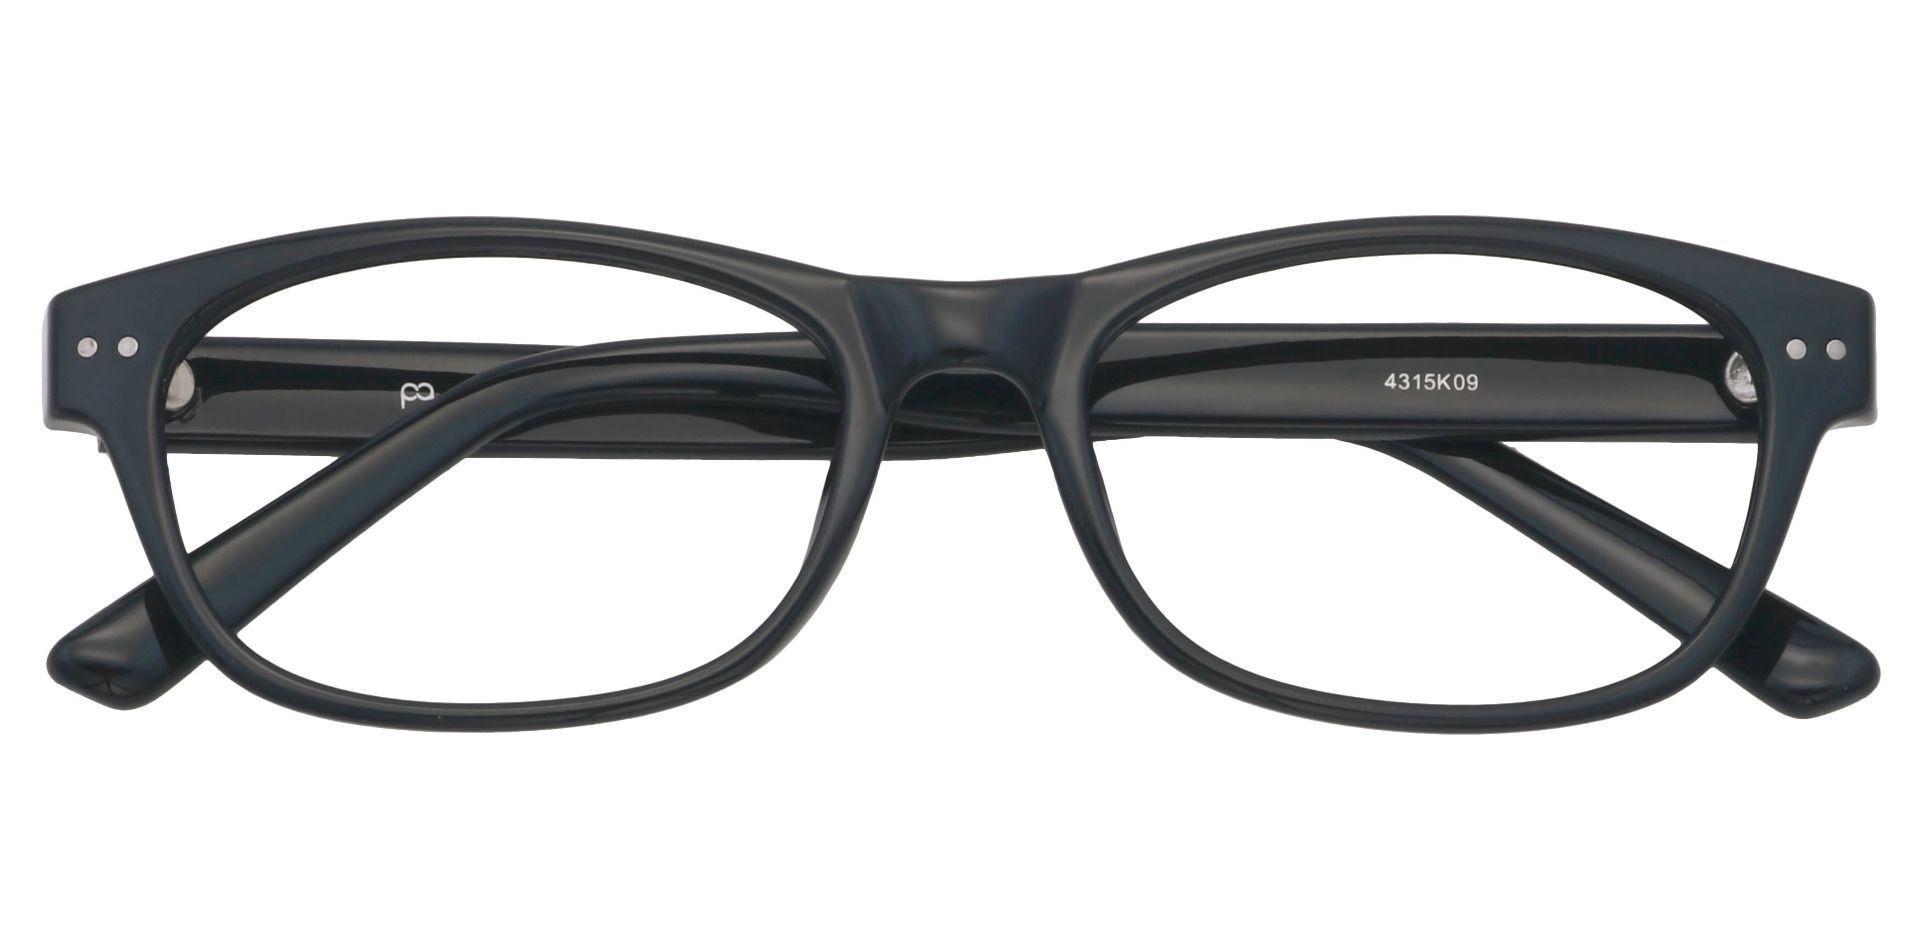 Gulf Rectangle Progressive Glasses - Black Crystal